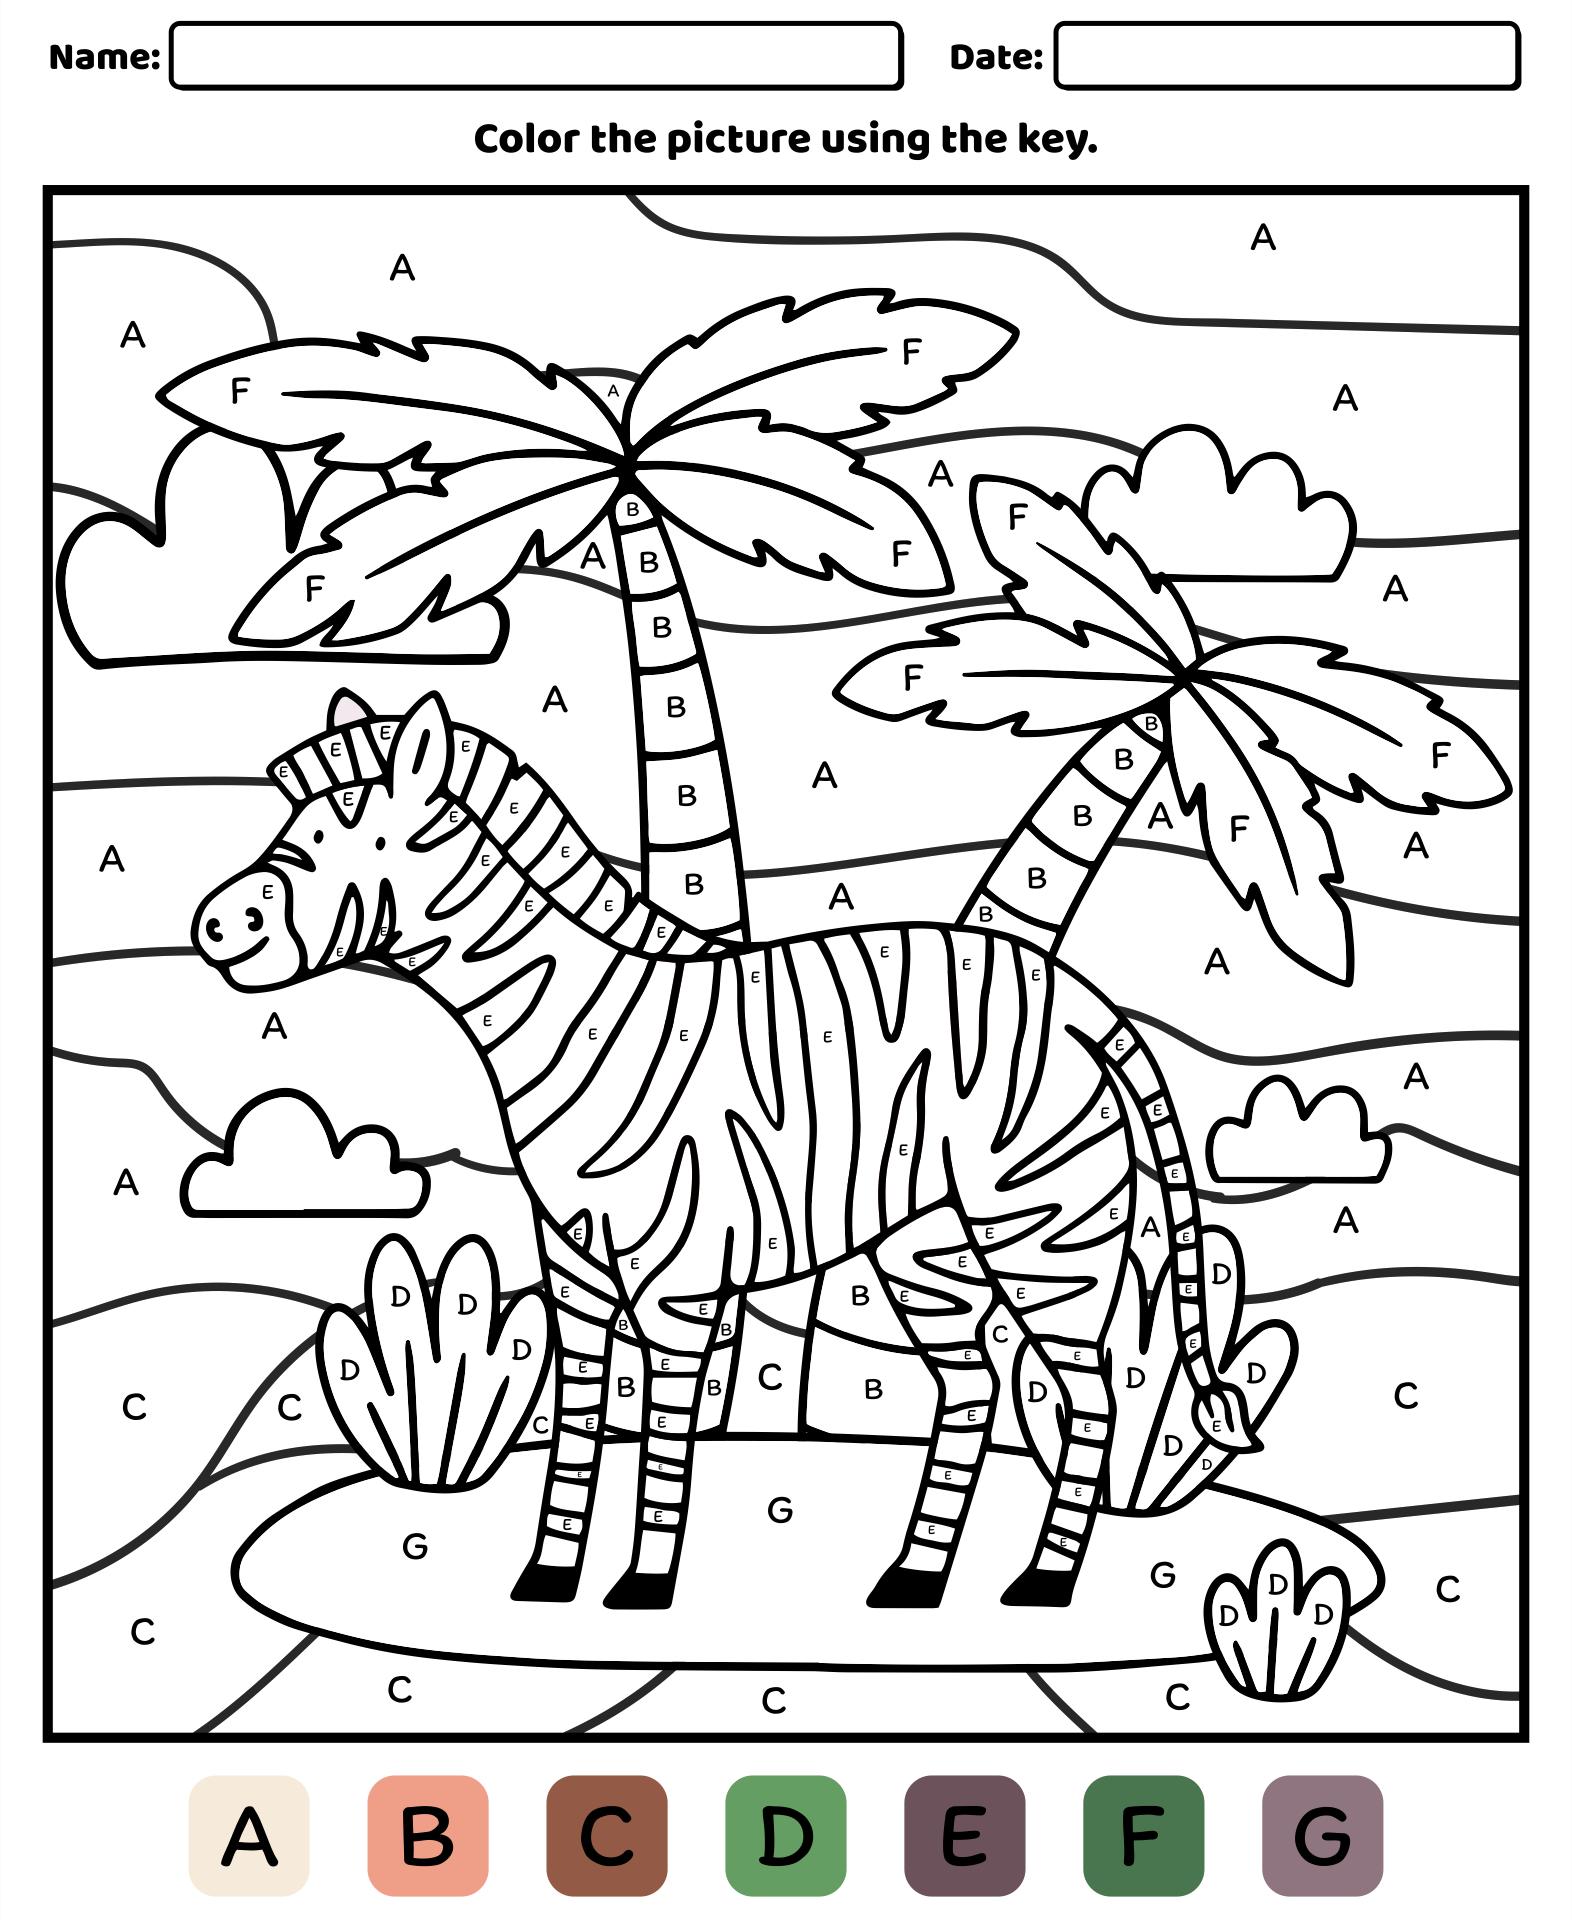 Number Names Worksheets free printable worksheet for preschool : 7 Best Images of Worksheets Color By Letter Printable - Free ...